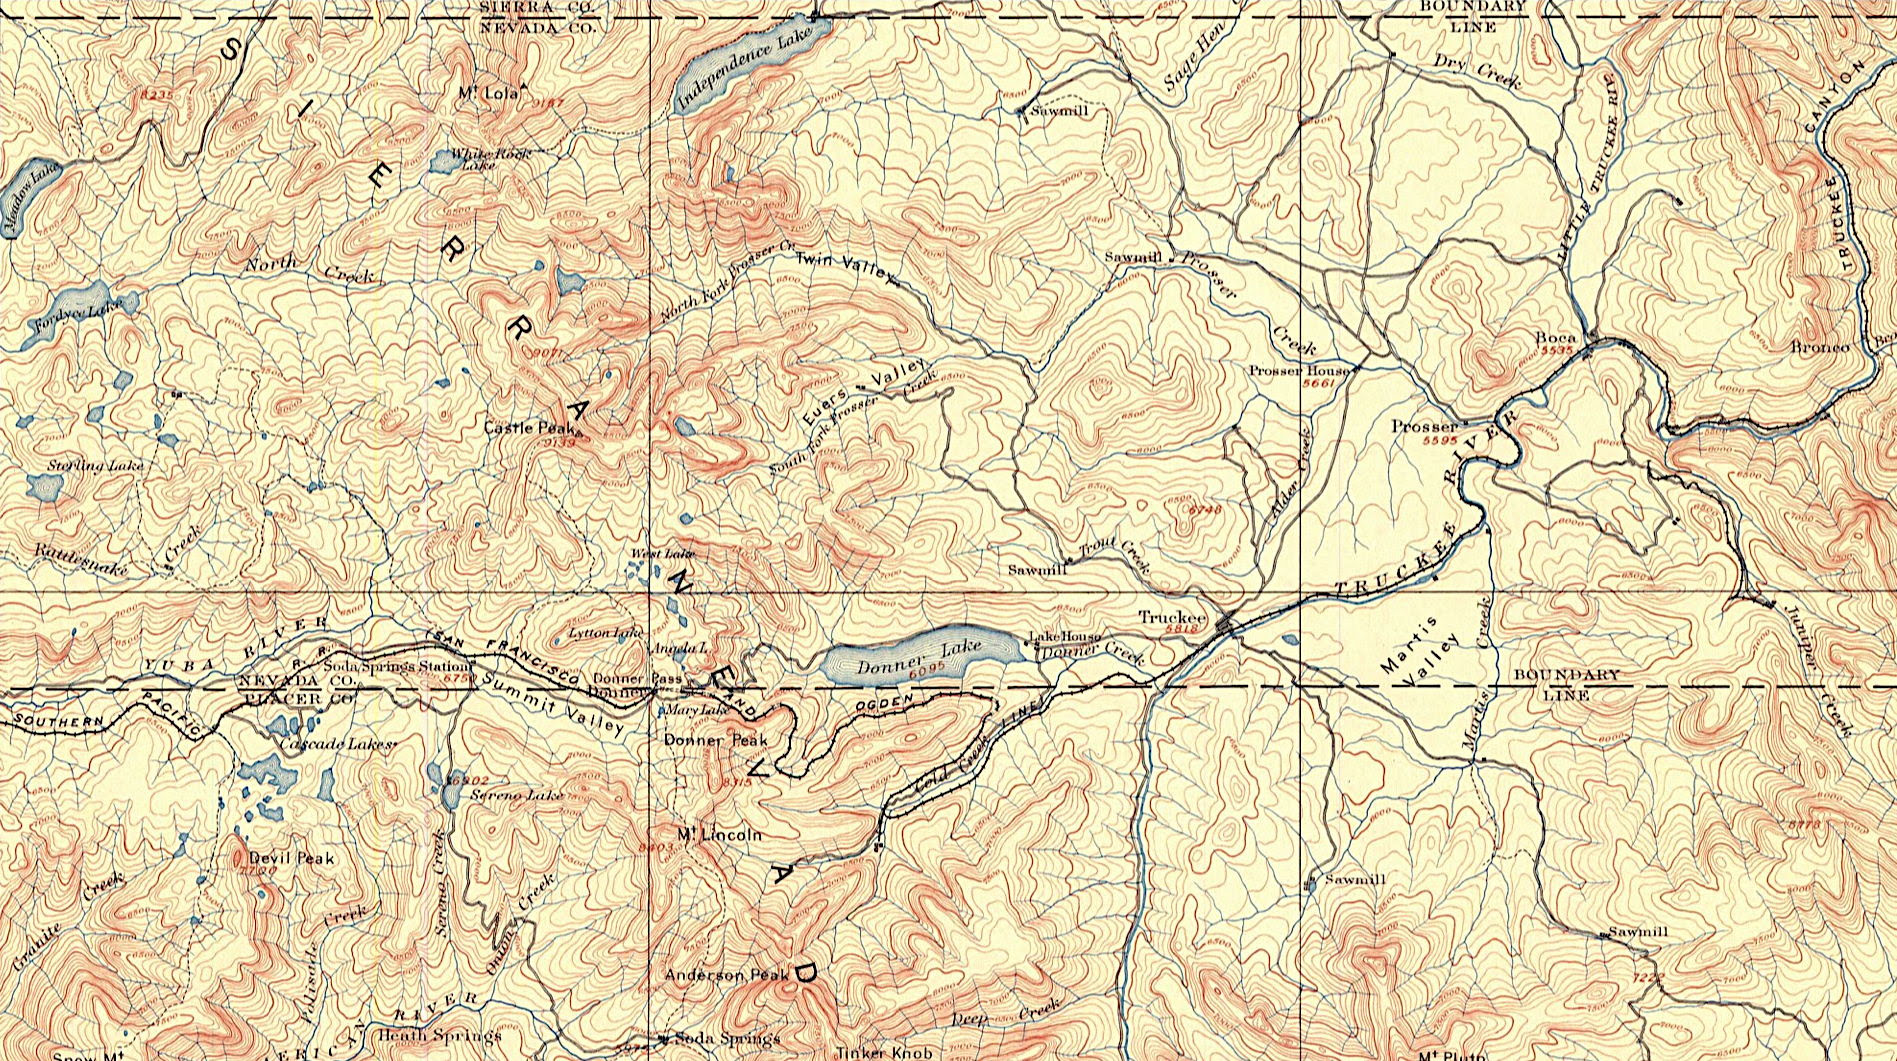 Truckee USGS folio, 1889